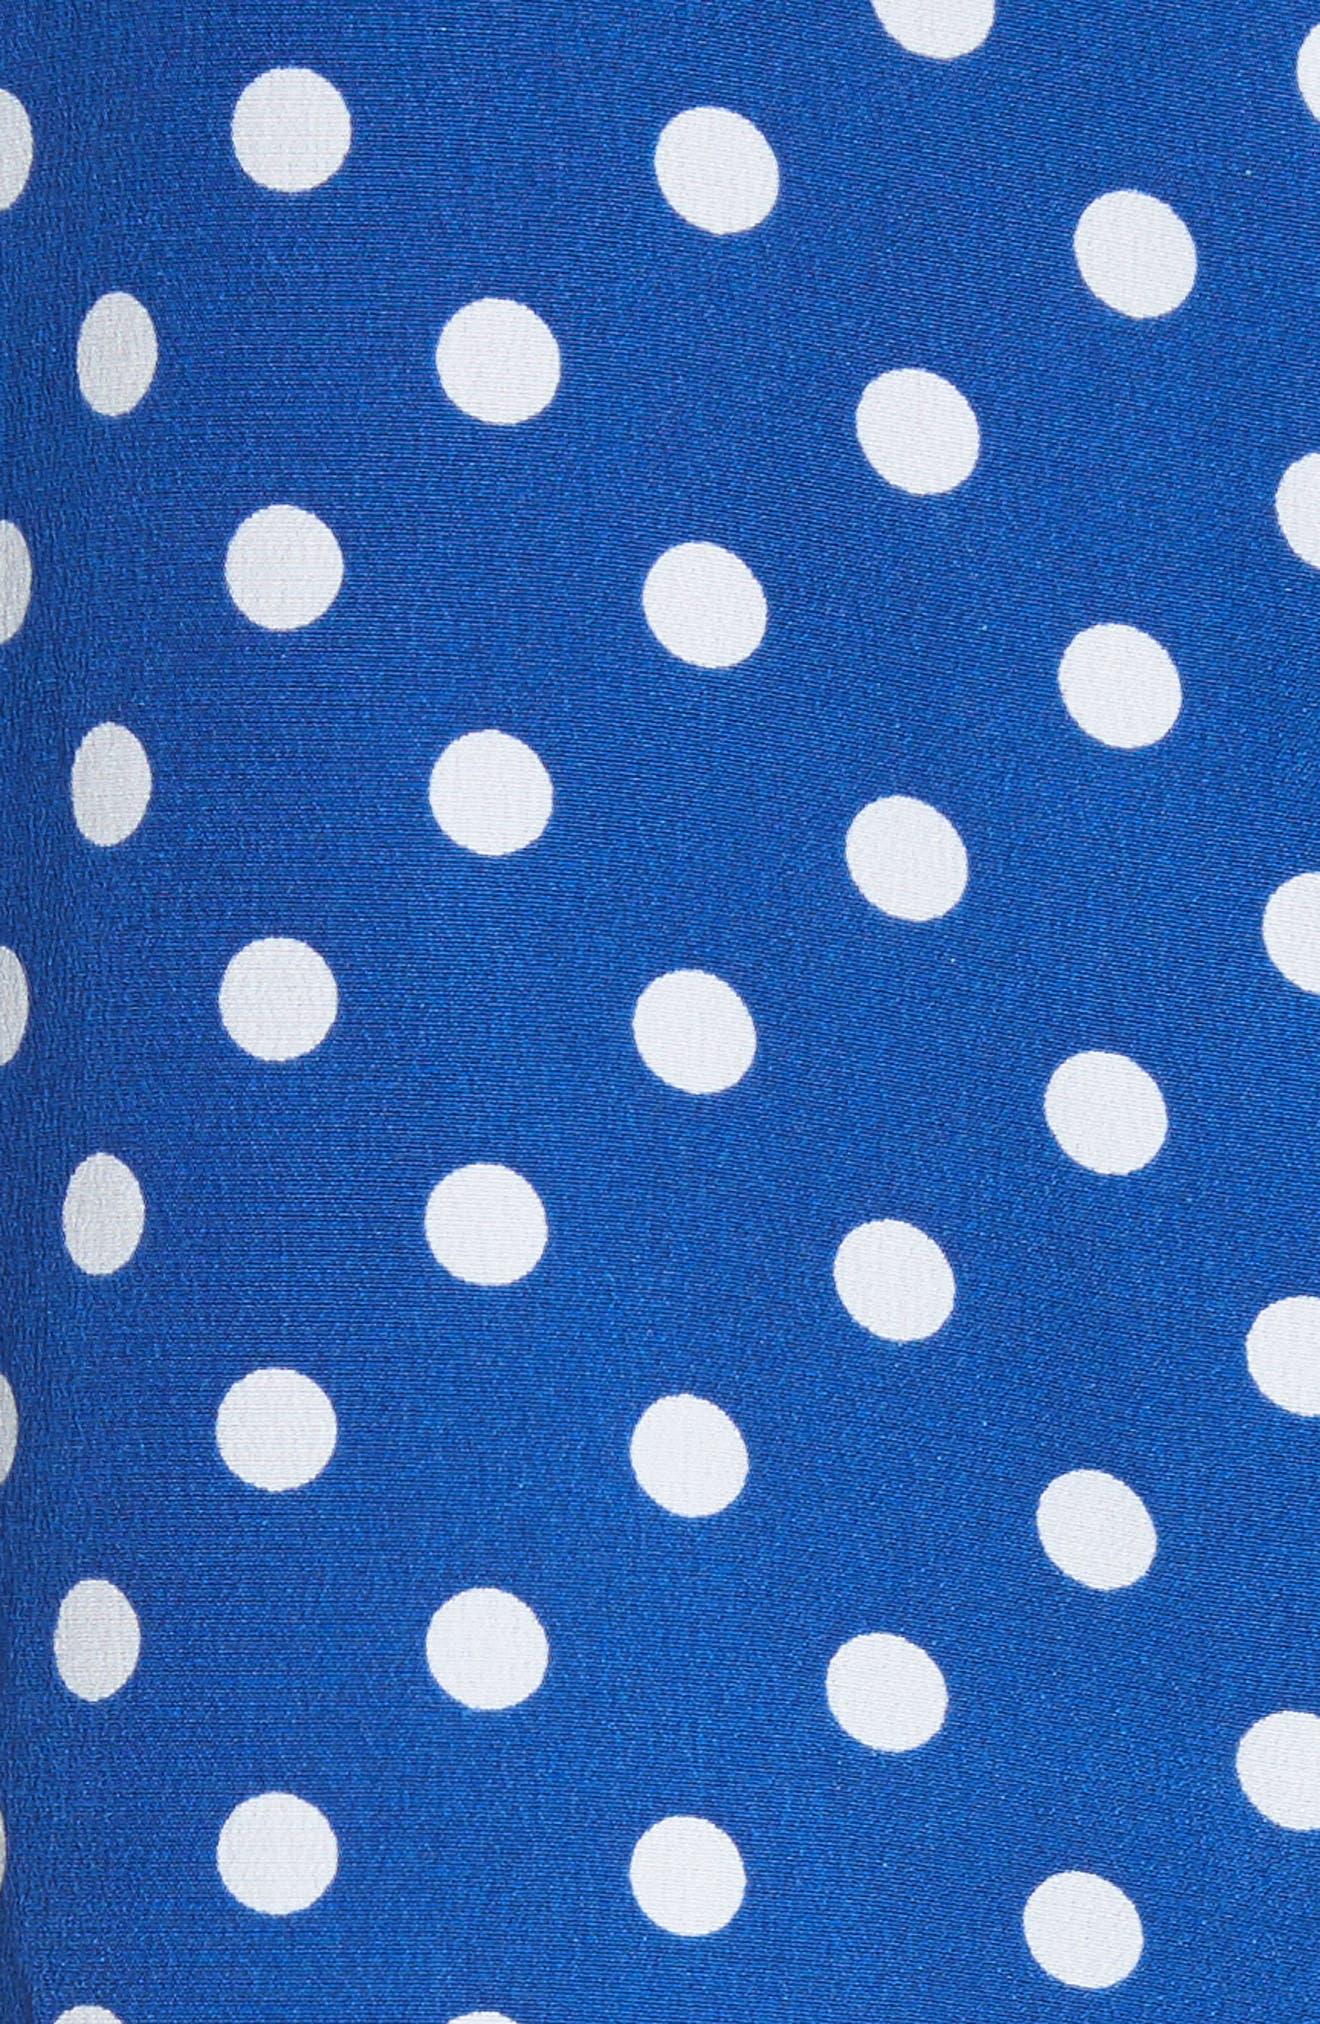 Brynn Polka Dot Silk Tee,                             Alternate thumbnail 5, color,                             Night Fall-Bright White